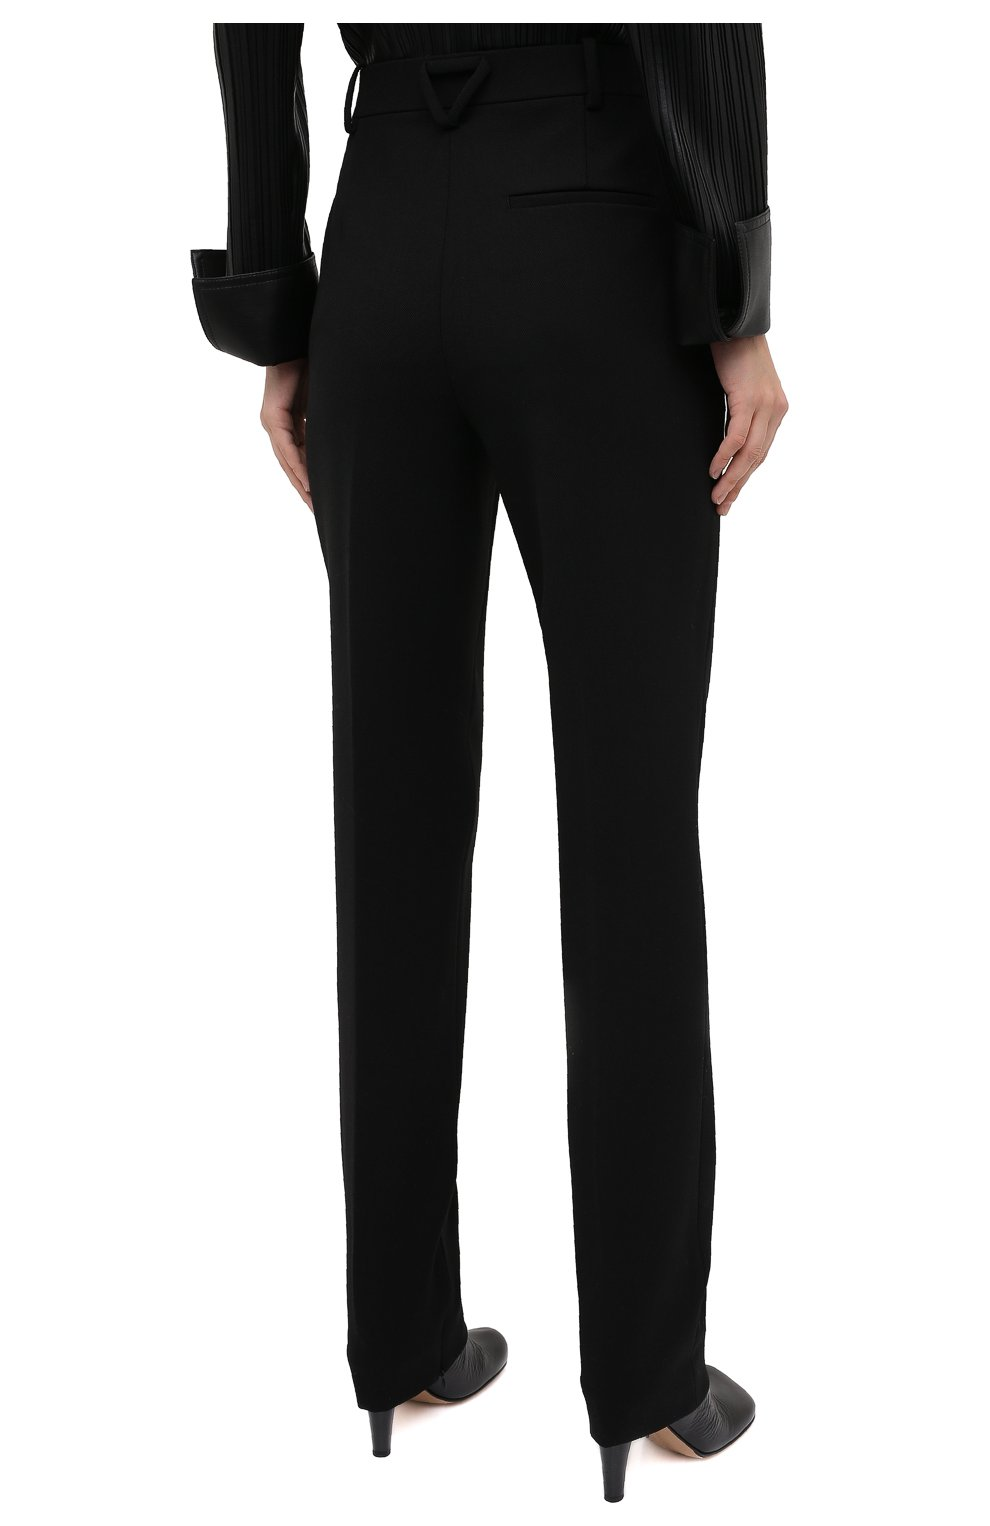 Женские брюки BOTTEGA VENETA черного цвета, арт. 636529/V02W0 | Фото 5